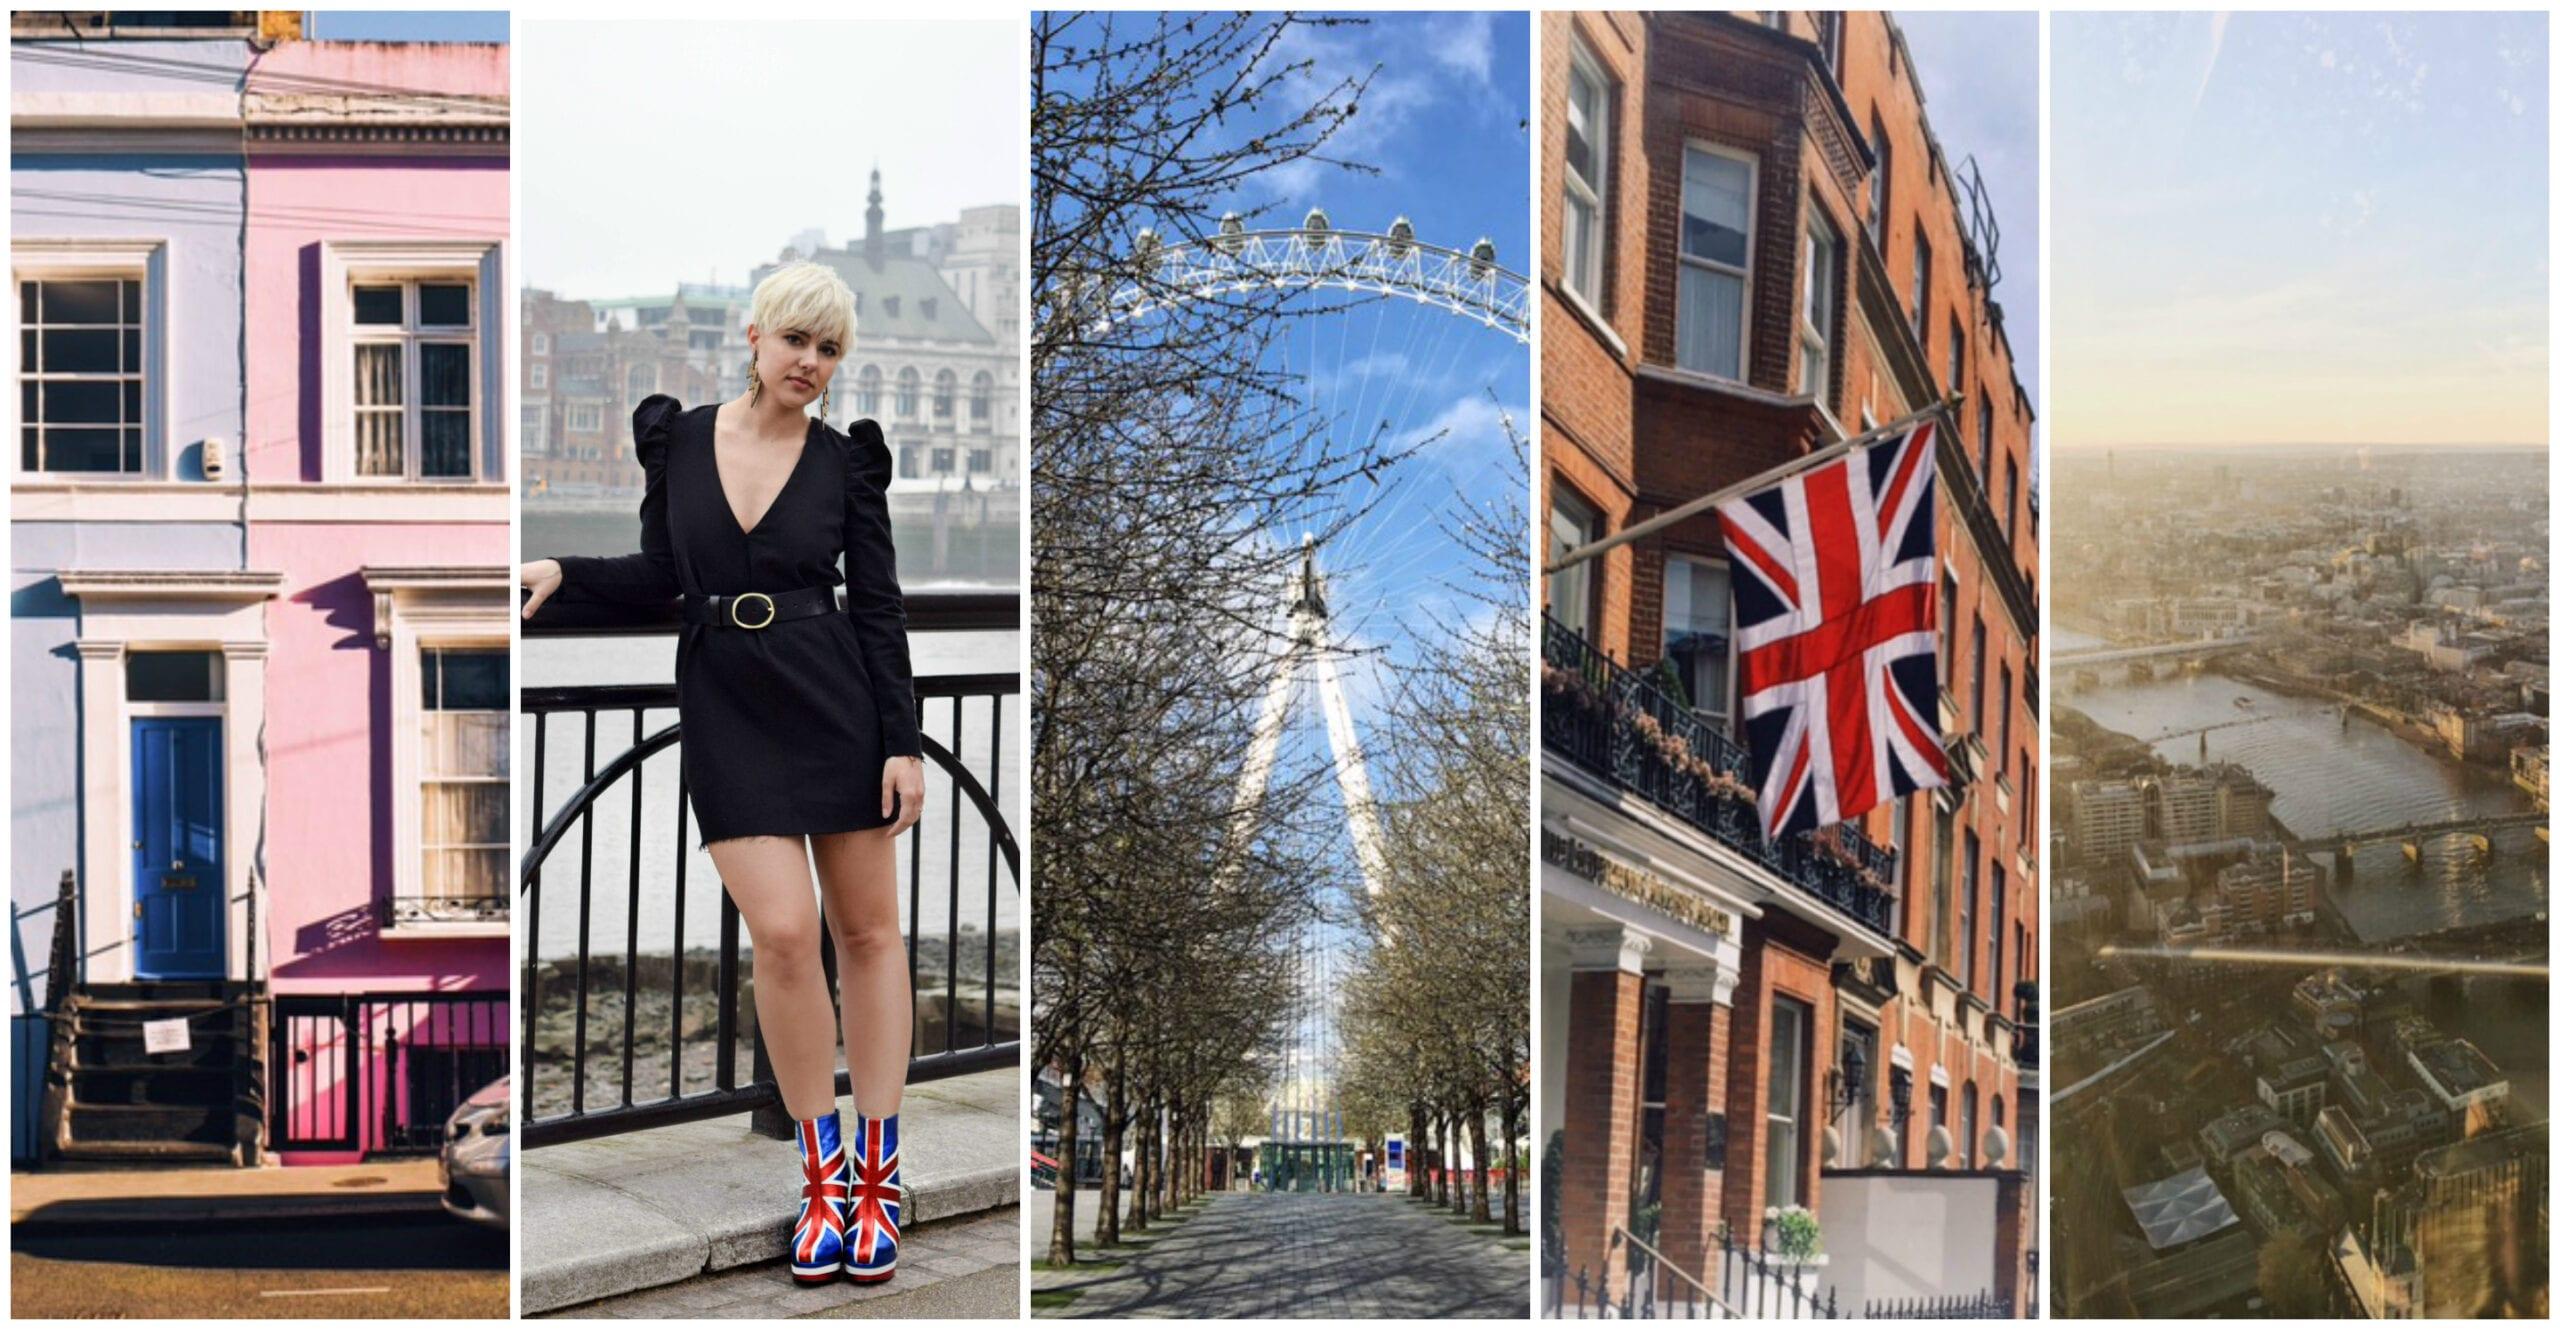 Seattle to London: A Fashion Blogger's Whirlwind London Travel Guide- Bloggernotbillionaire.com